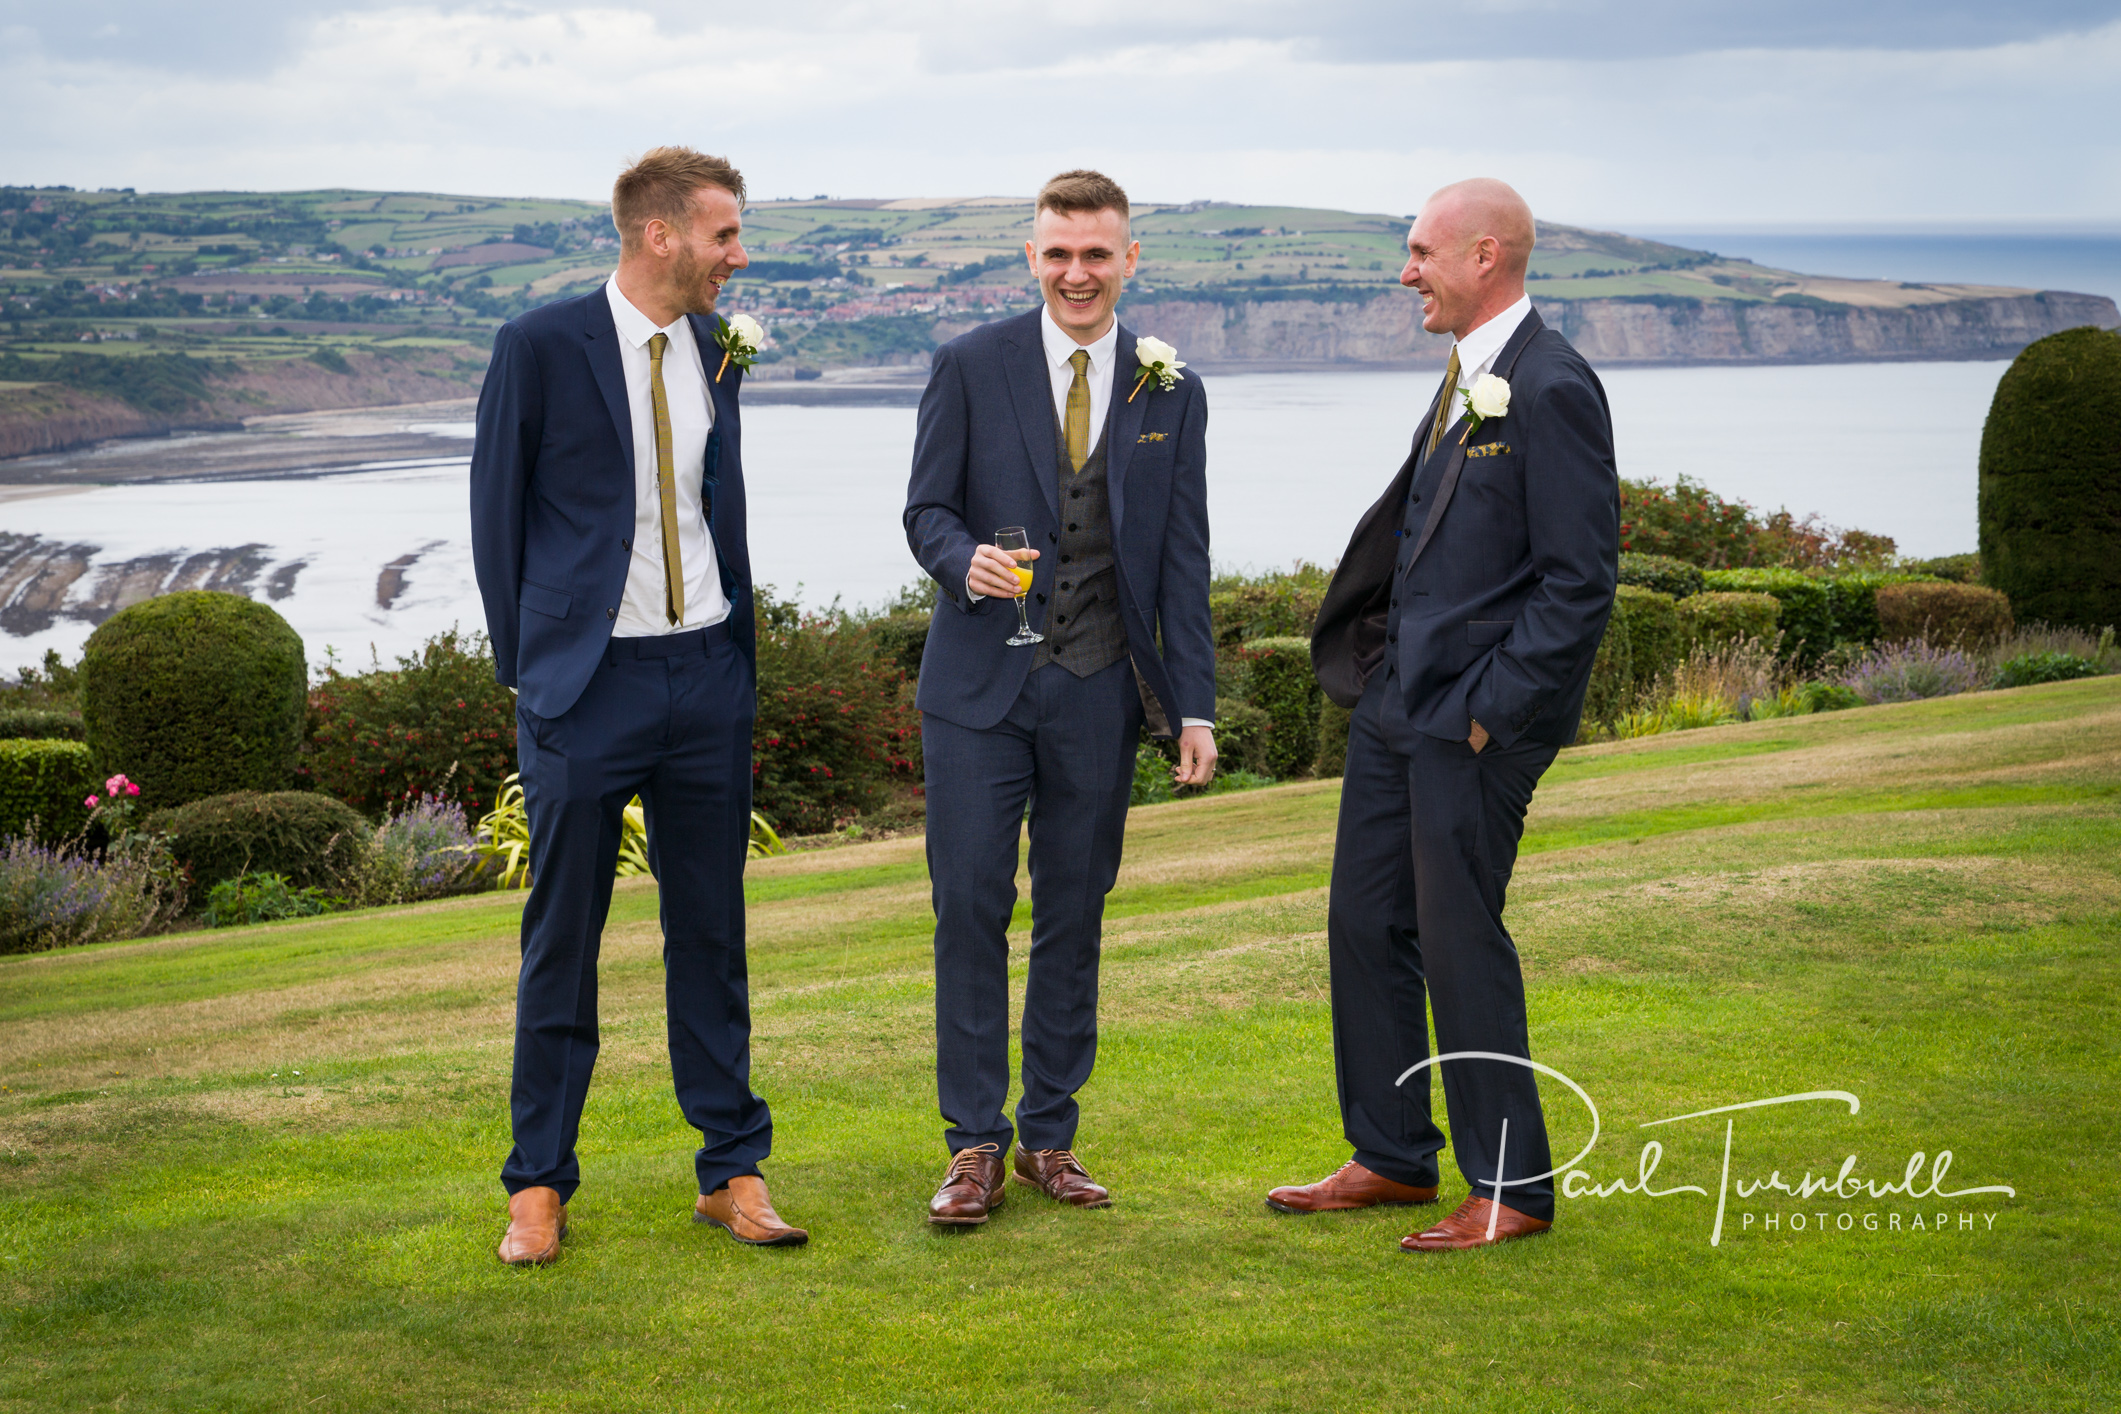 wedding-photographer-raven-hall-ravenscroft--scarborough-yorkshire-lucy-ryan-061.jpg